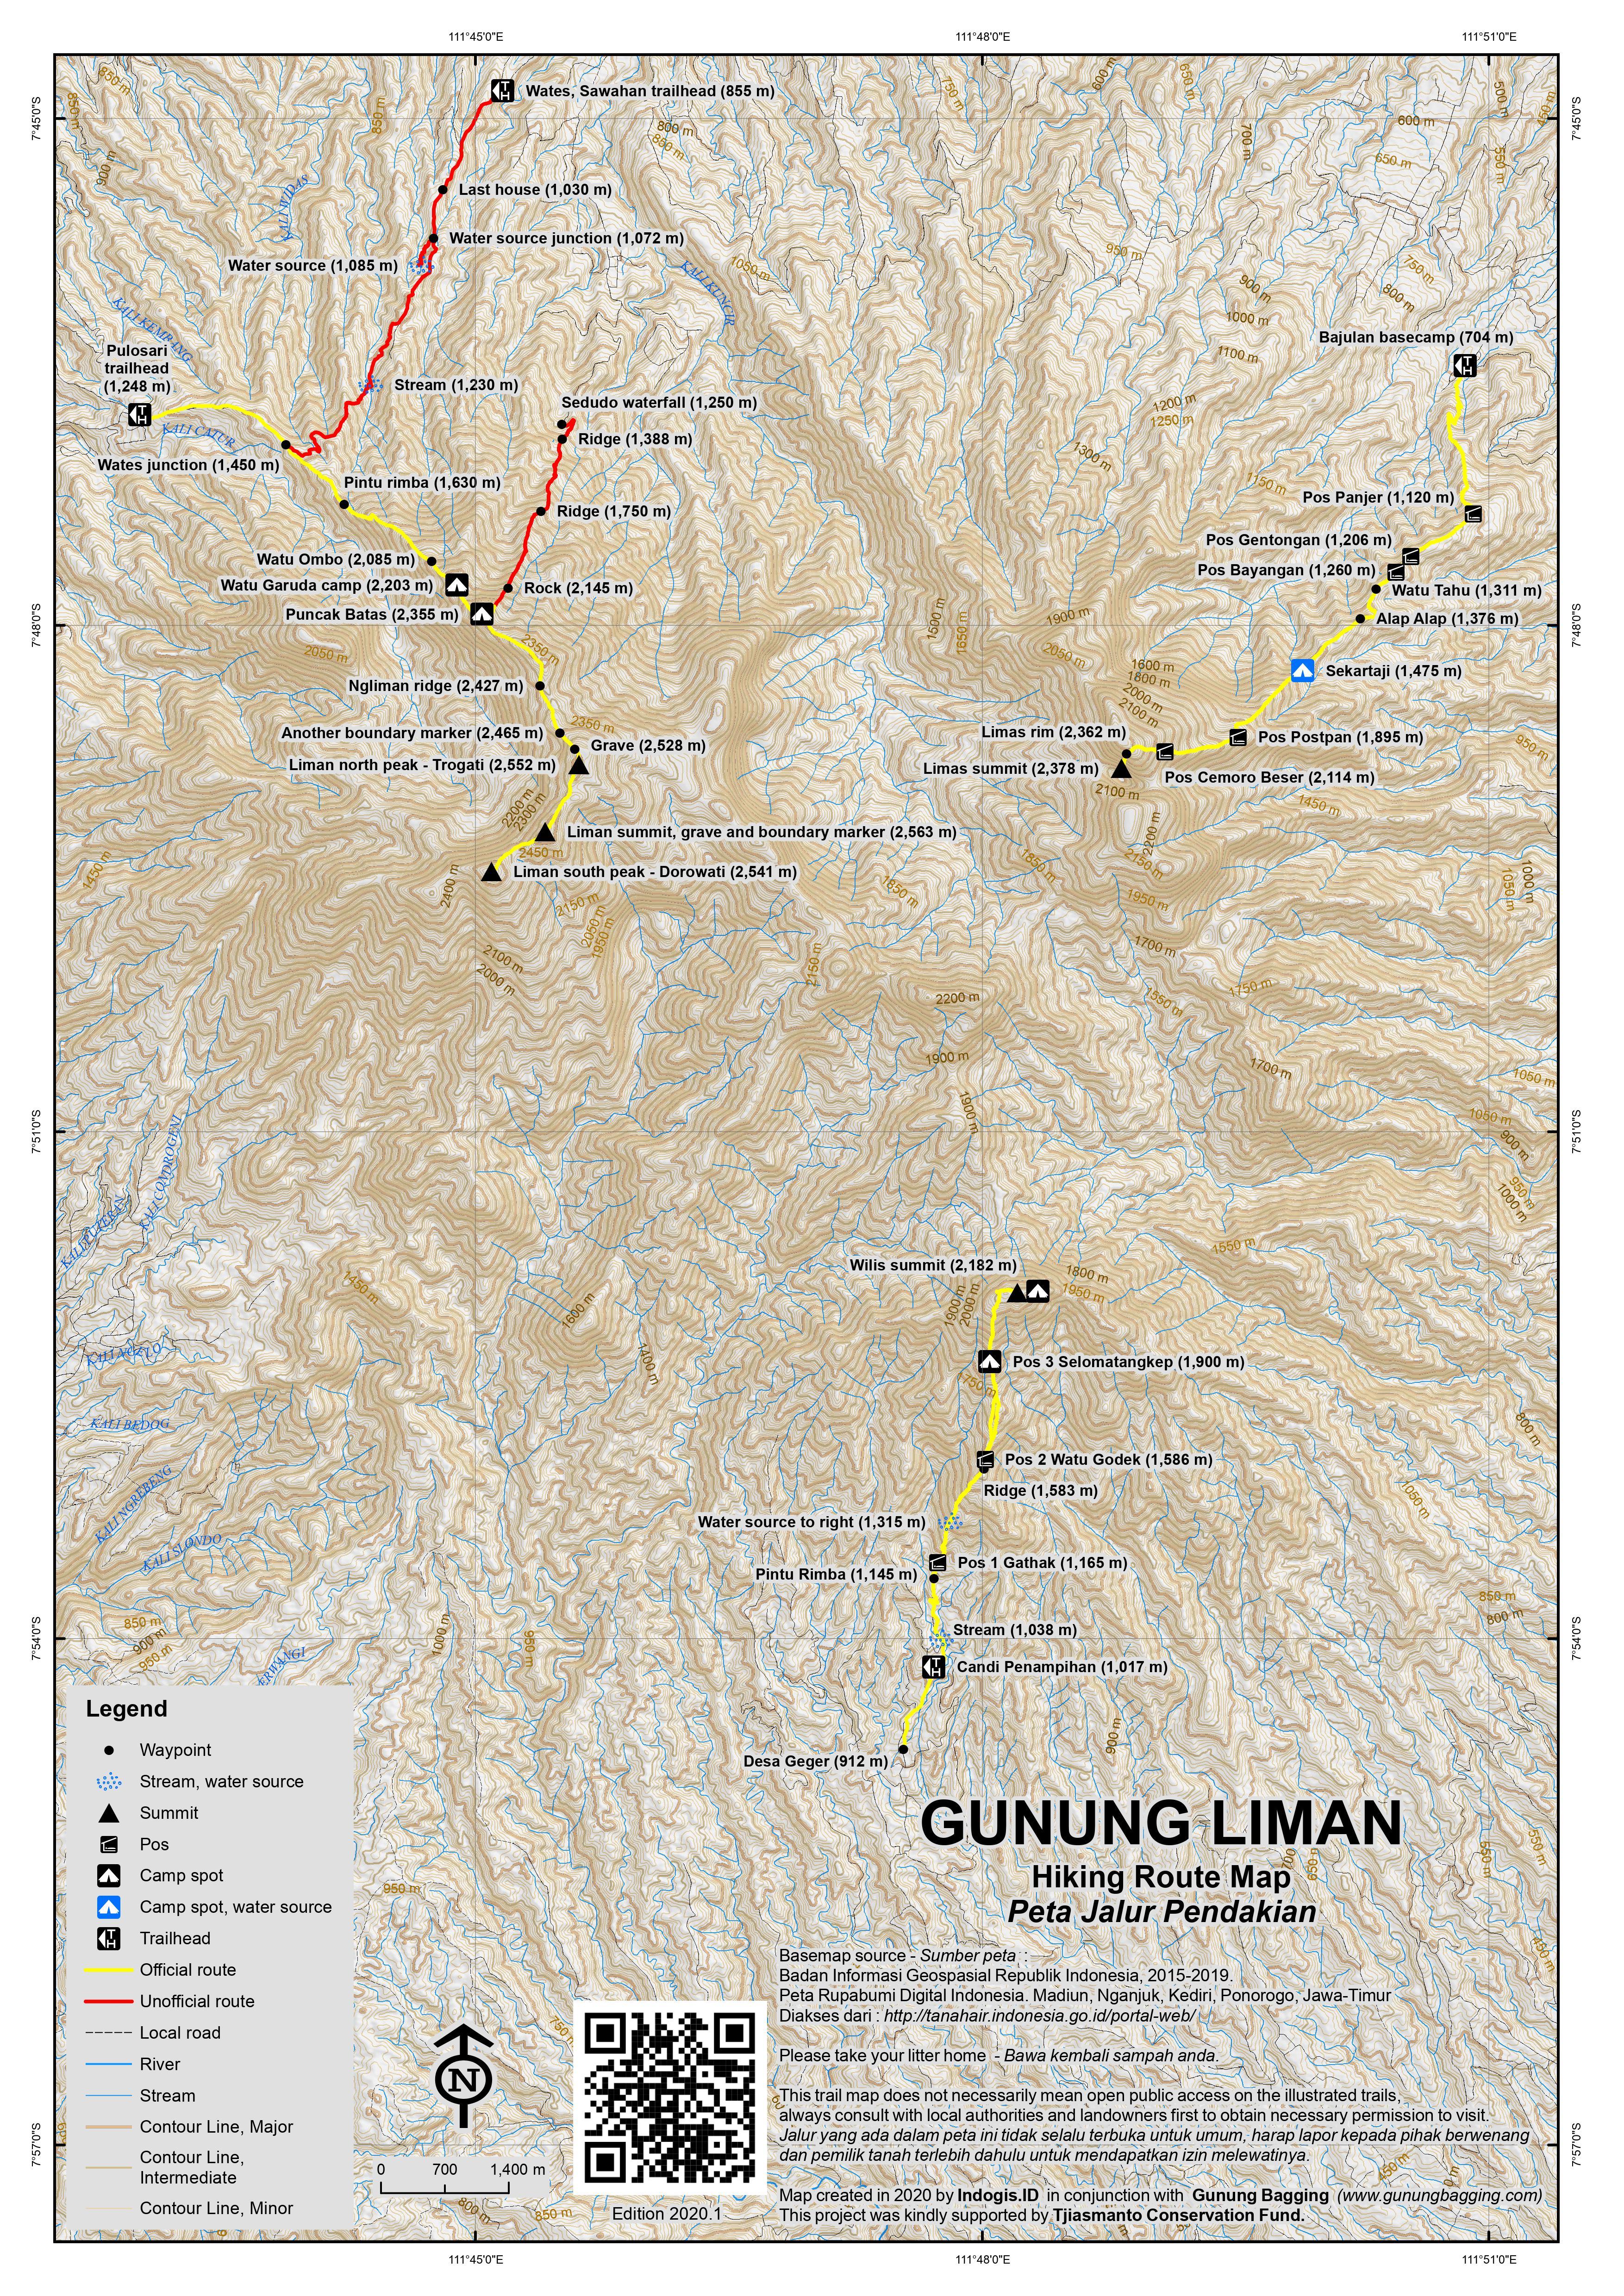 Peta Jalur Pendakian Gunung Liman